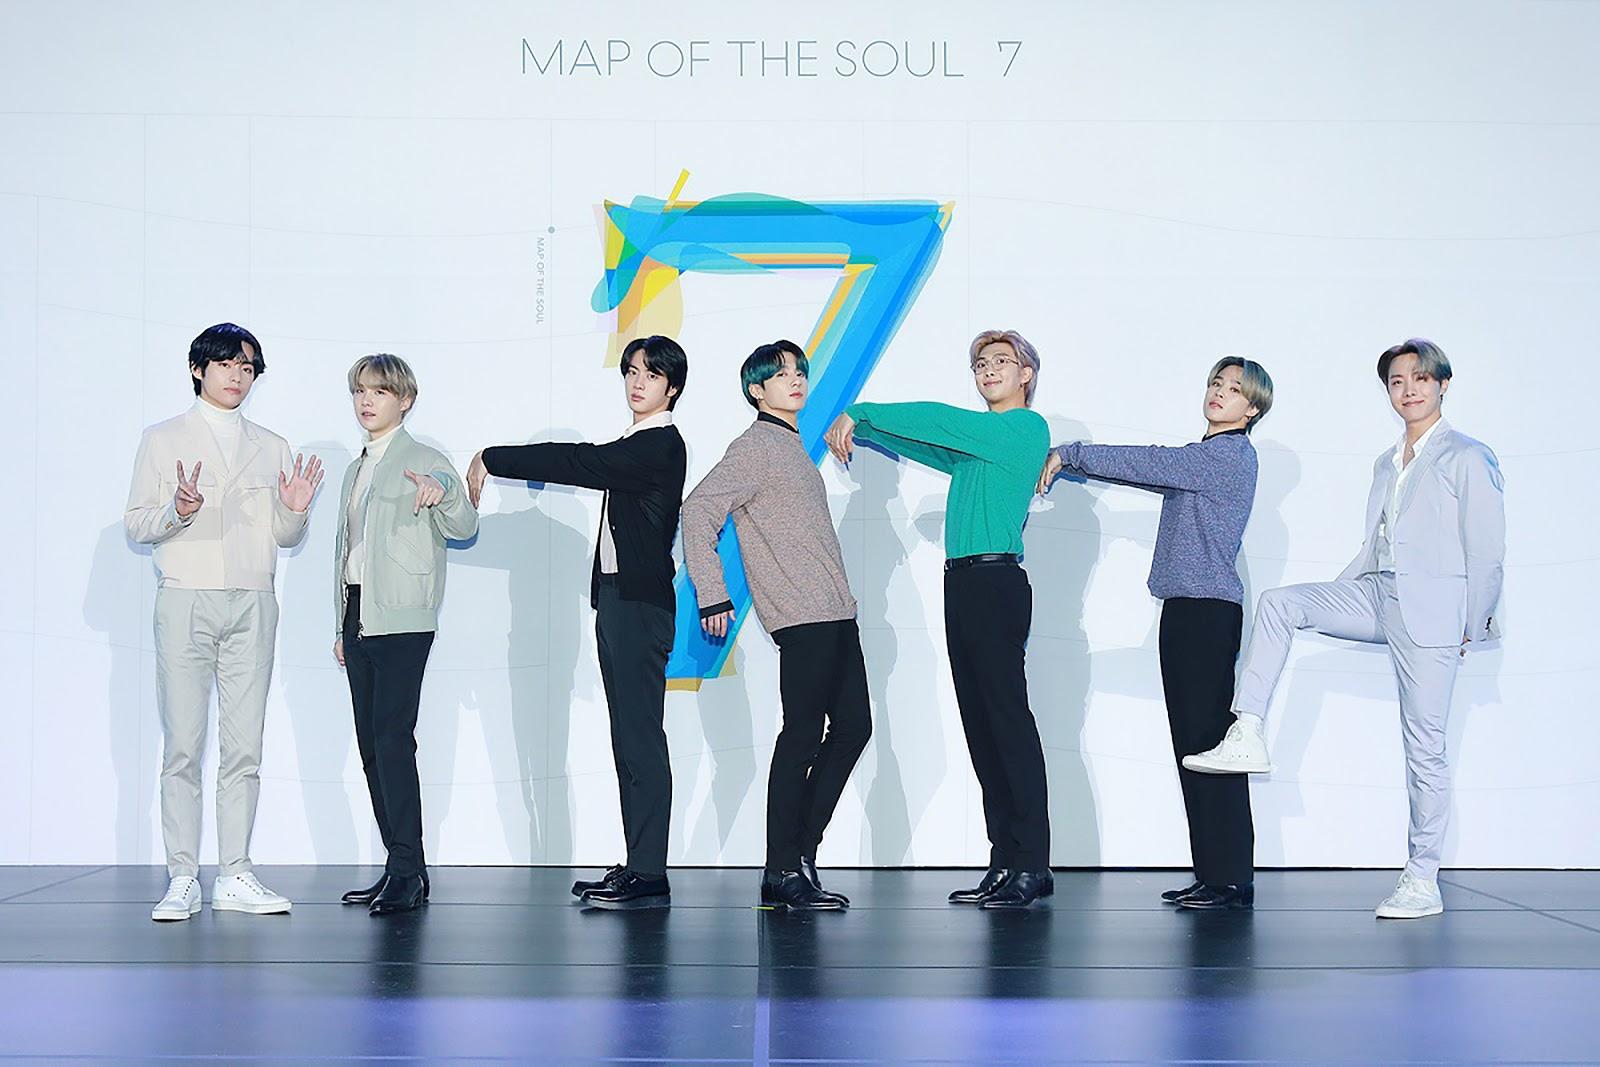 SKOREA-MUSIC-BTS-CHINA-HEALTH-VIRUS